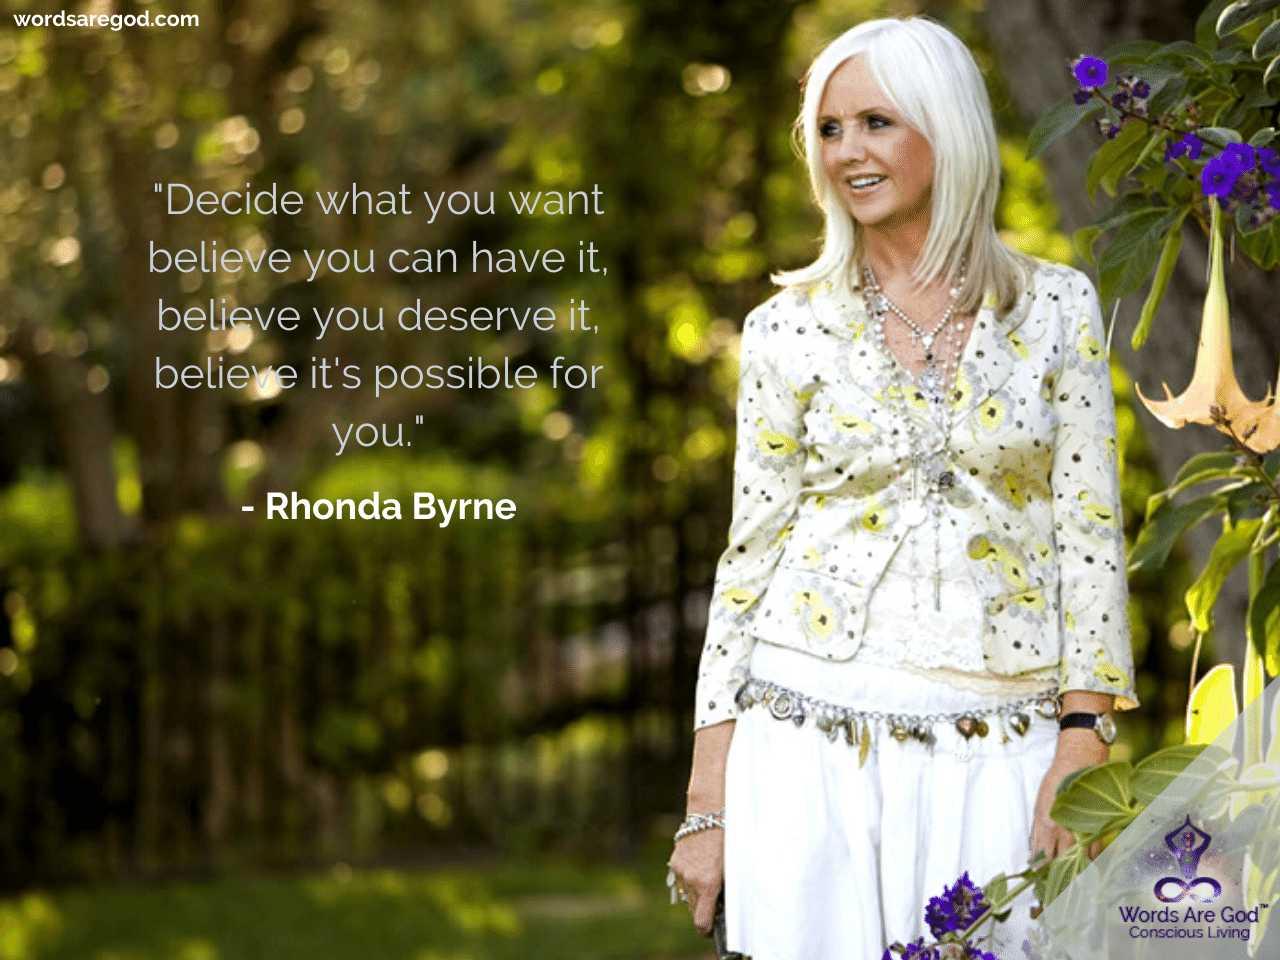 Rhonda Byrne Life Quotes by Rhonda Byrne